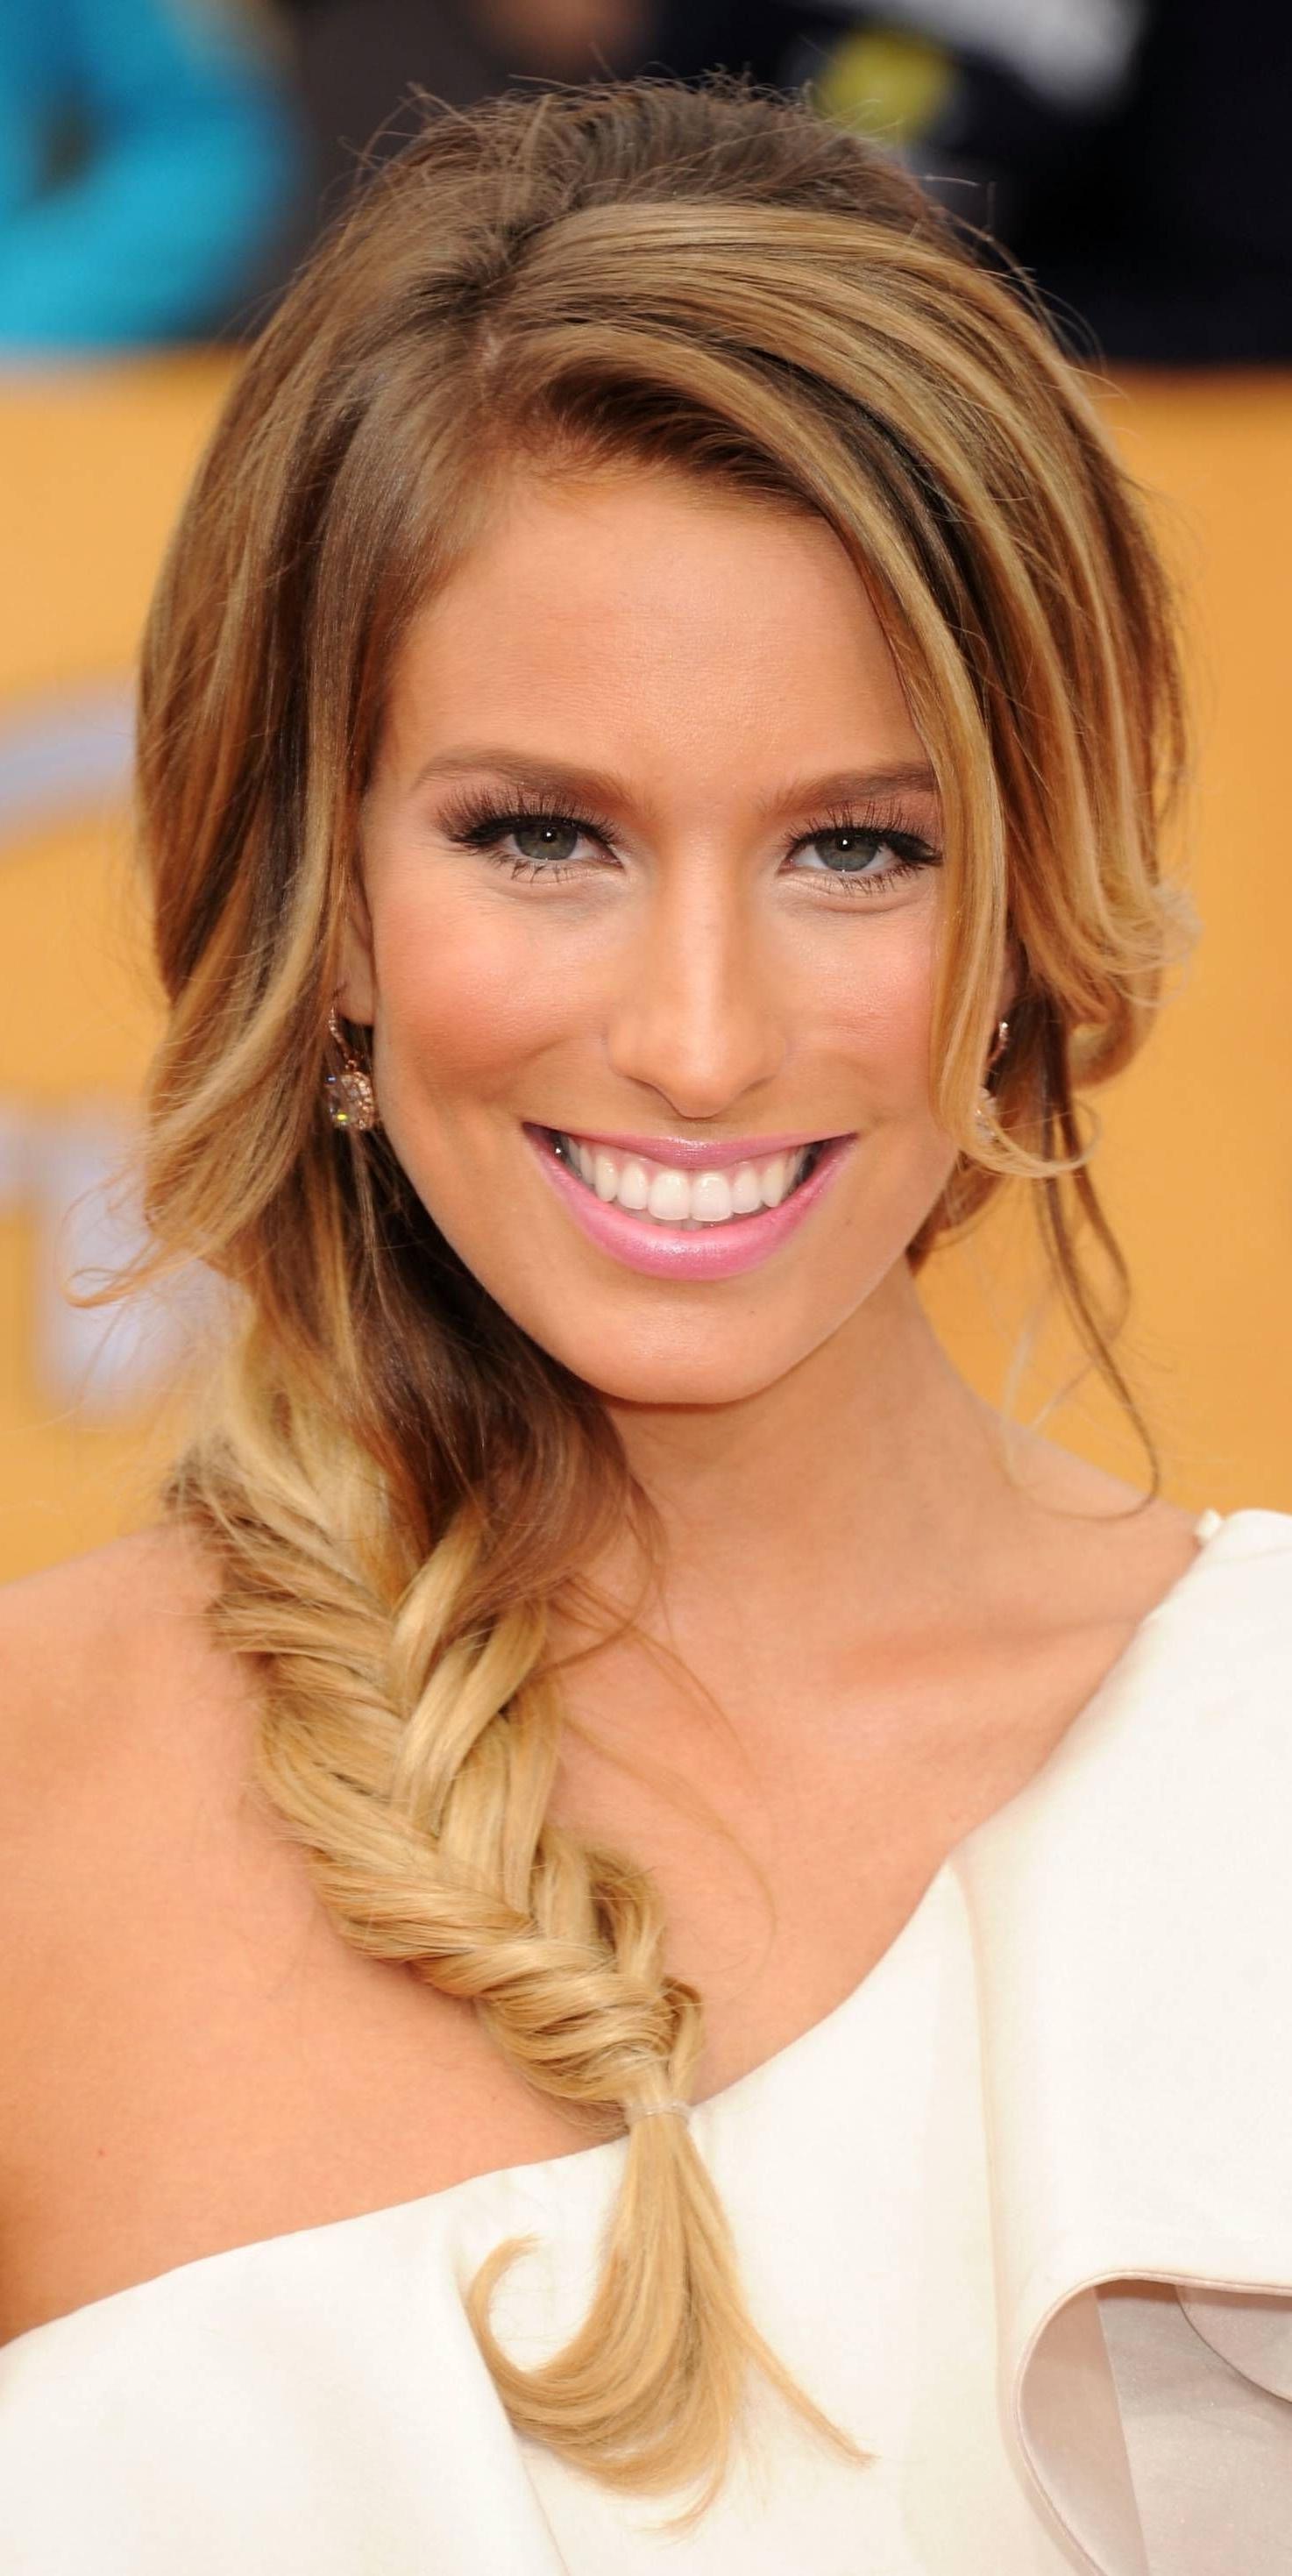 Braids: Hairstyles Featuring Braids (View 4 of 20)